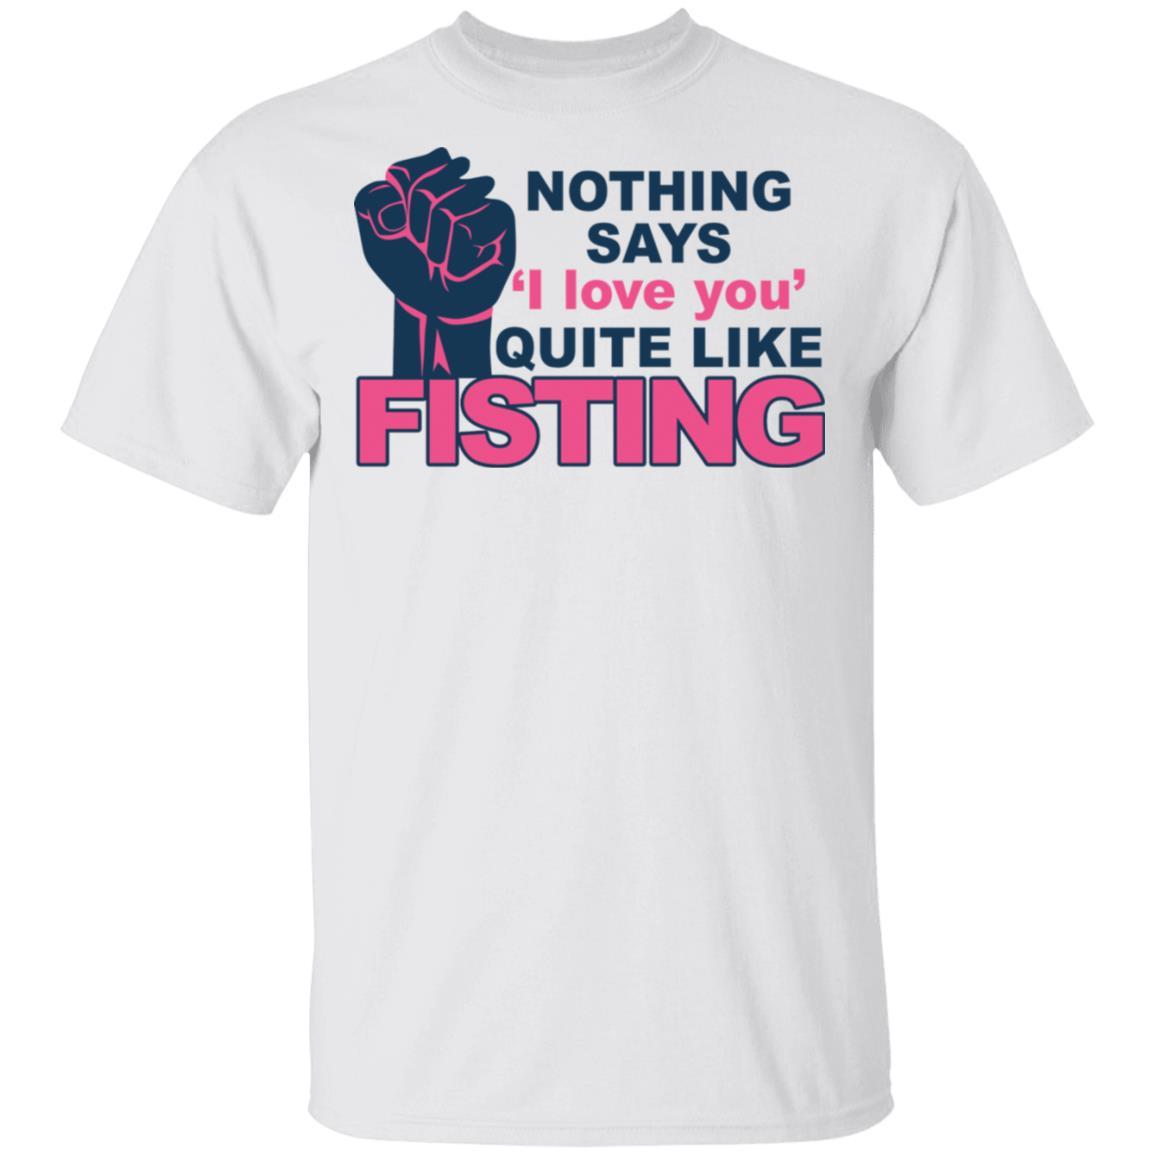 Nothing says I love you quite like fisting shirt, sweatshirt, hoodie